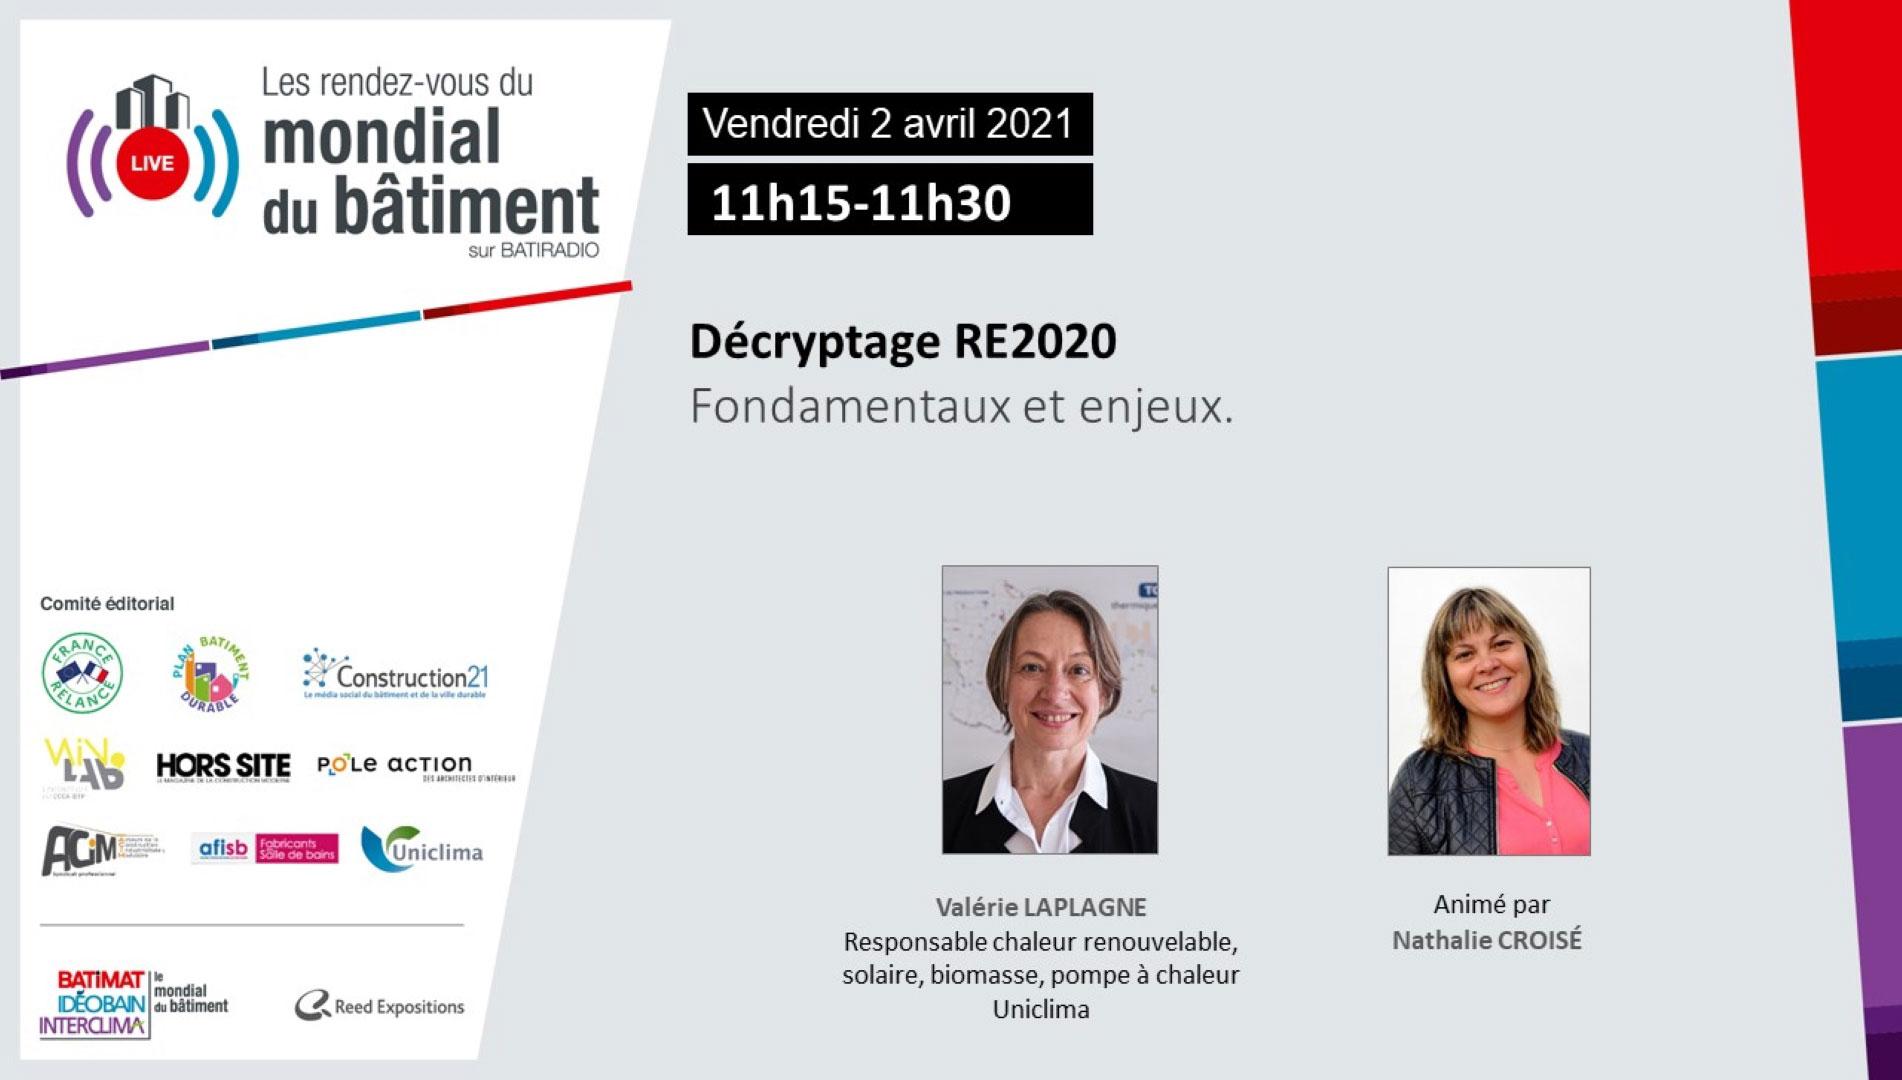 Décryptage RE2020 RDV du Mondial